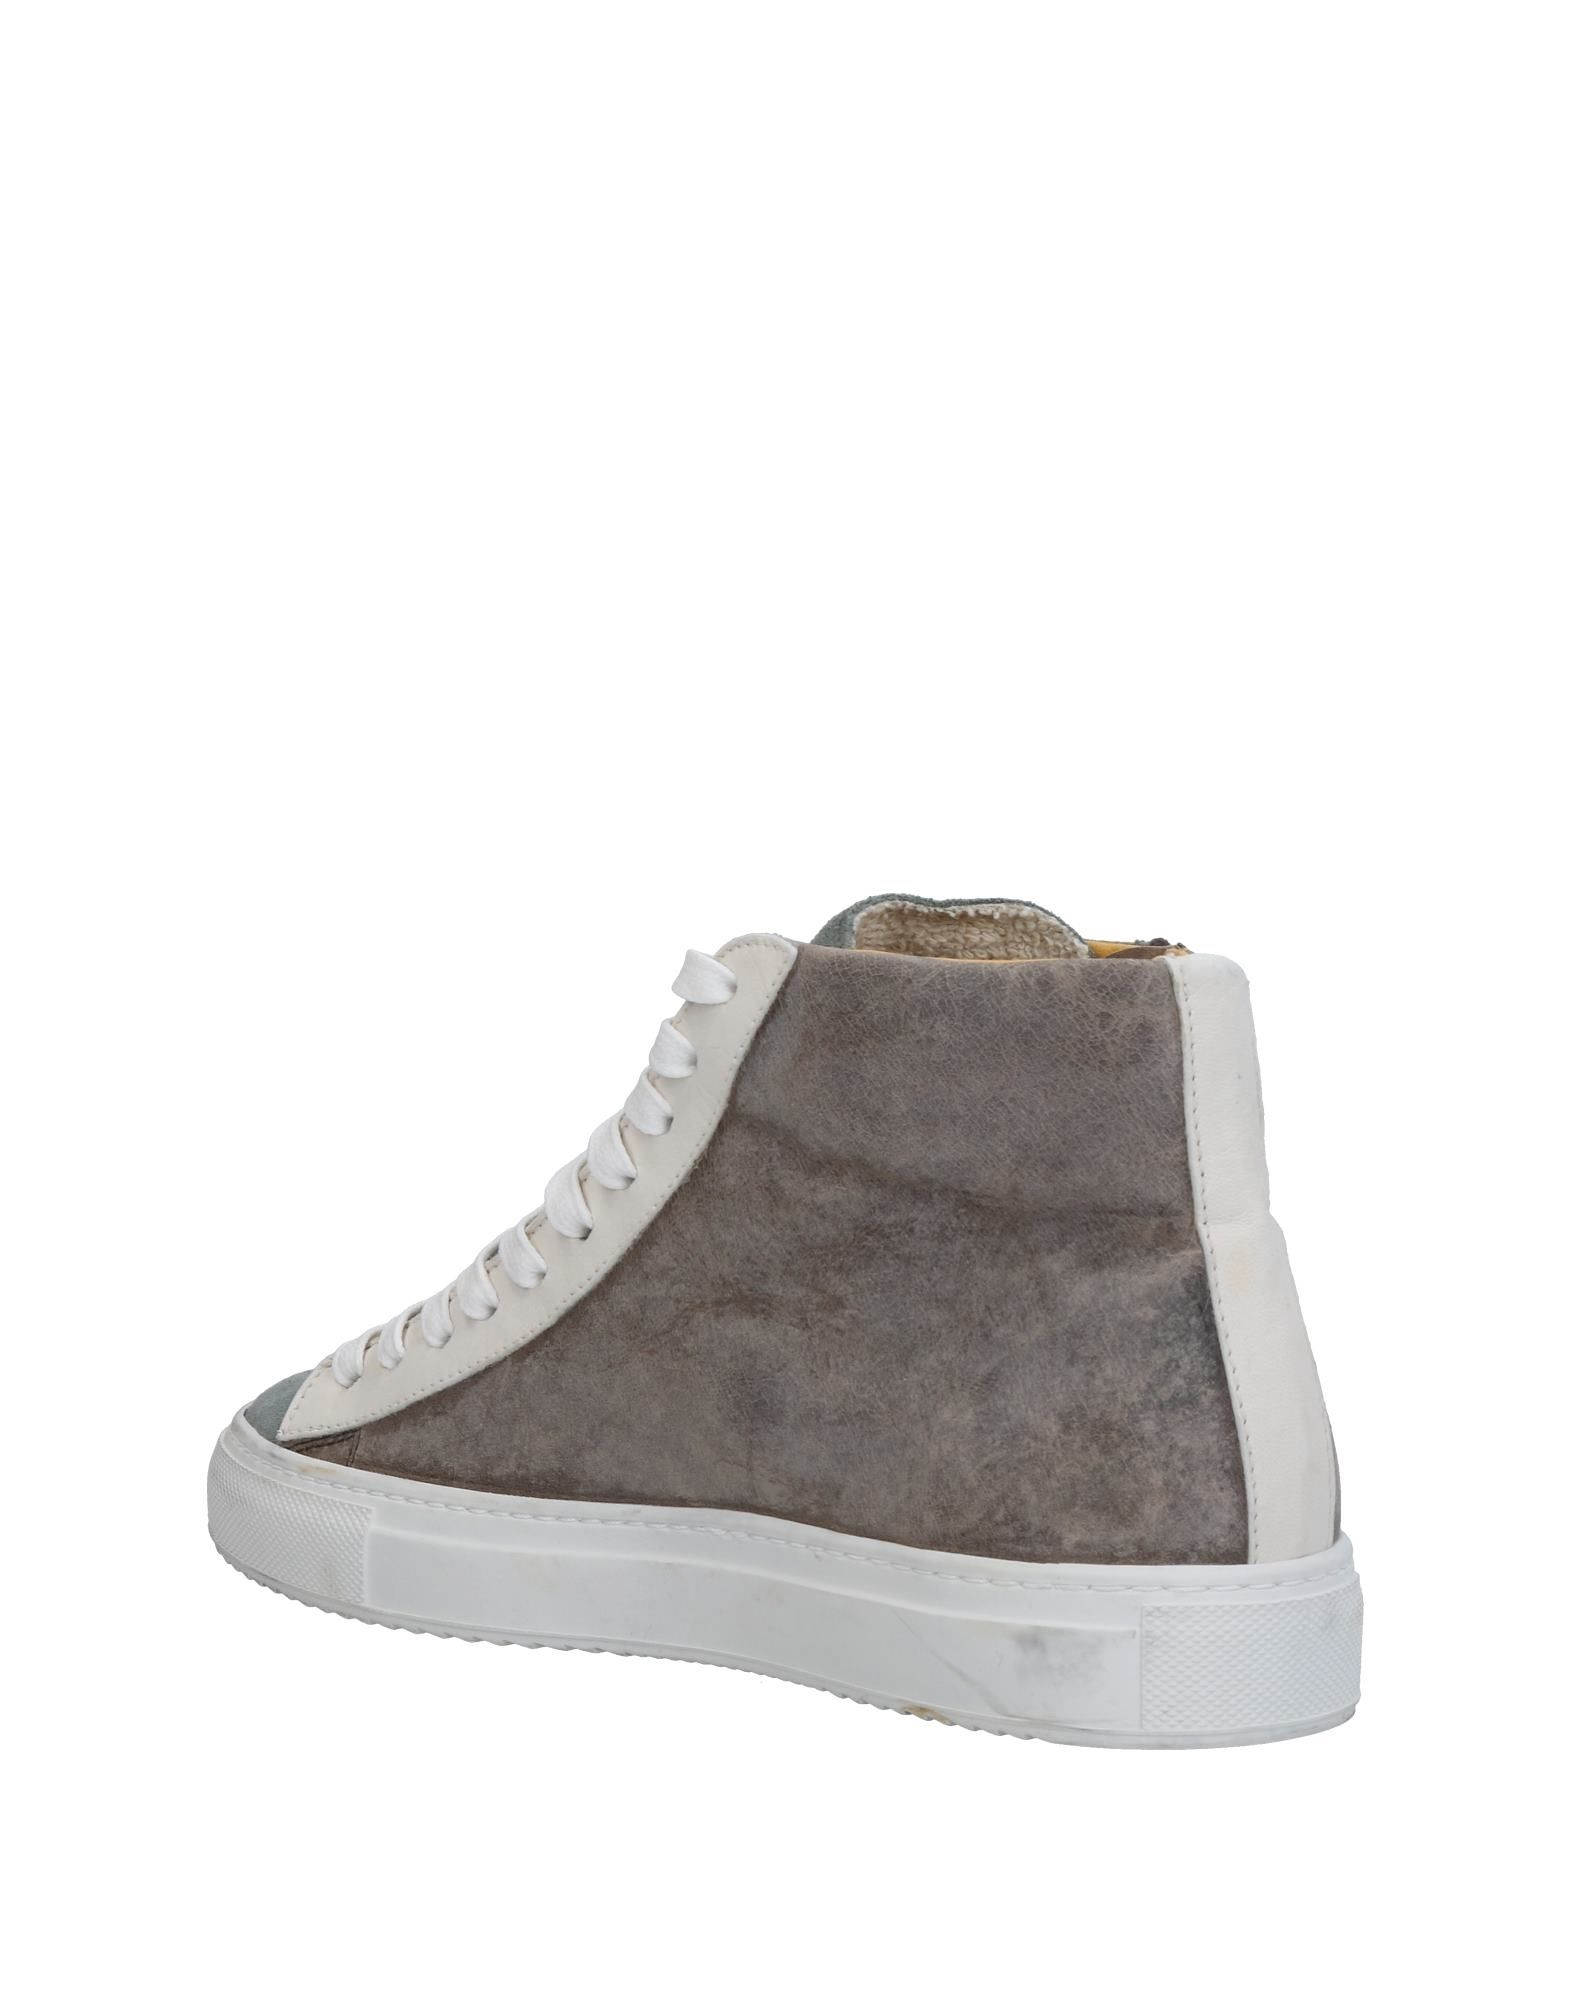 Quattrobarradodici Gute Sneakers Damen  11459472TW Gute Quattrobarradodici Qualität beliebte Schuhe c324e1